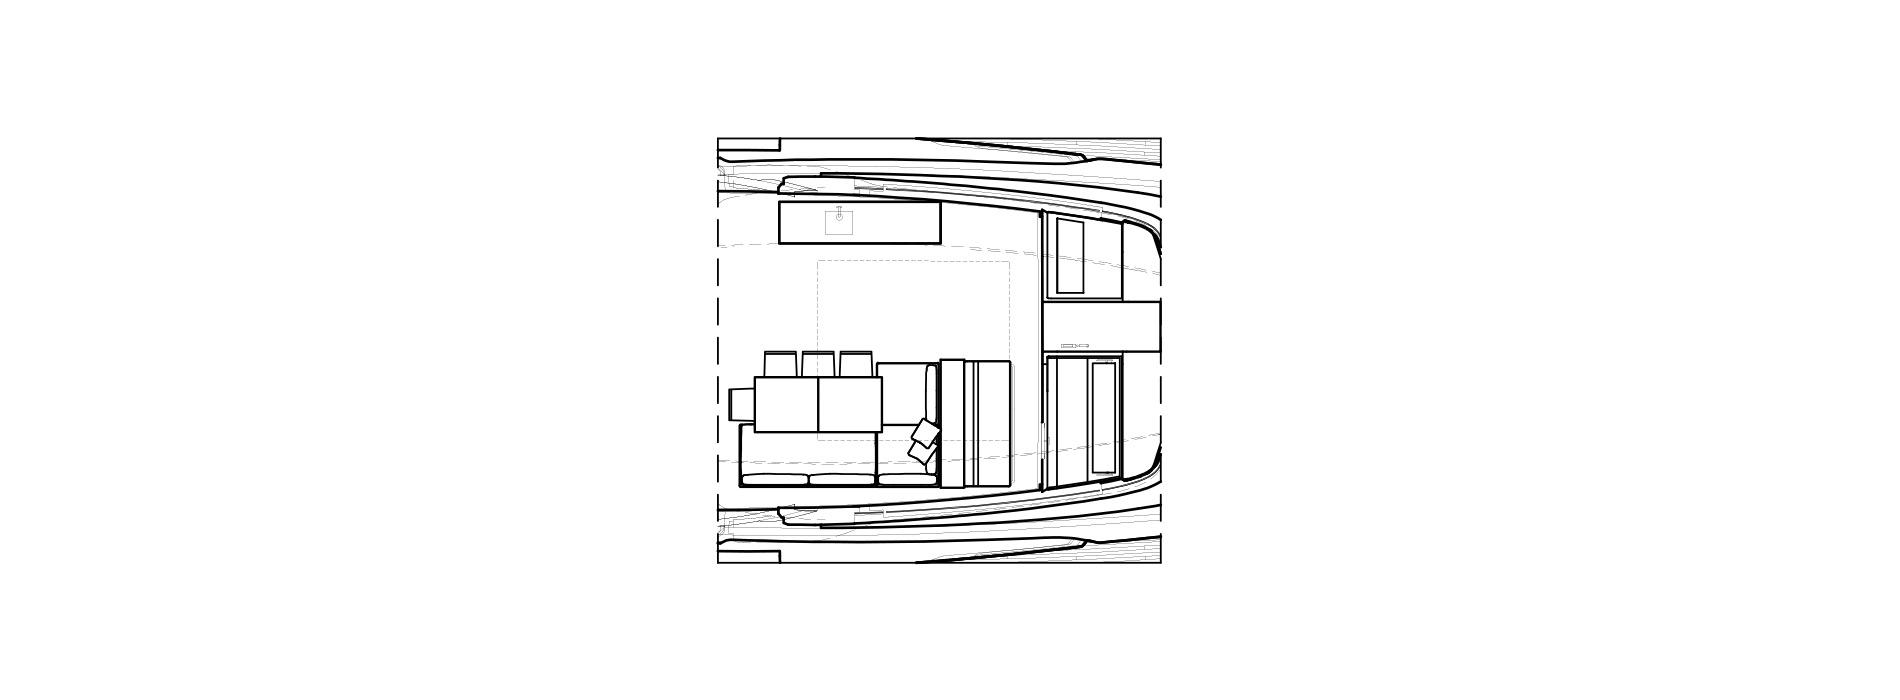 Sanlorenzo Yachts SX88 Detalles Versione USA